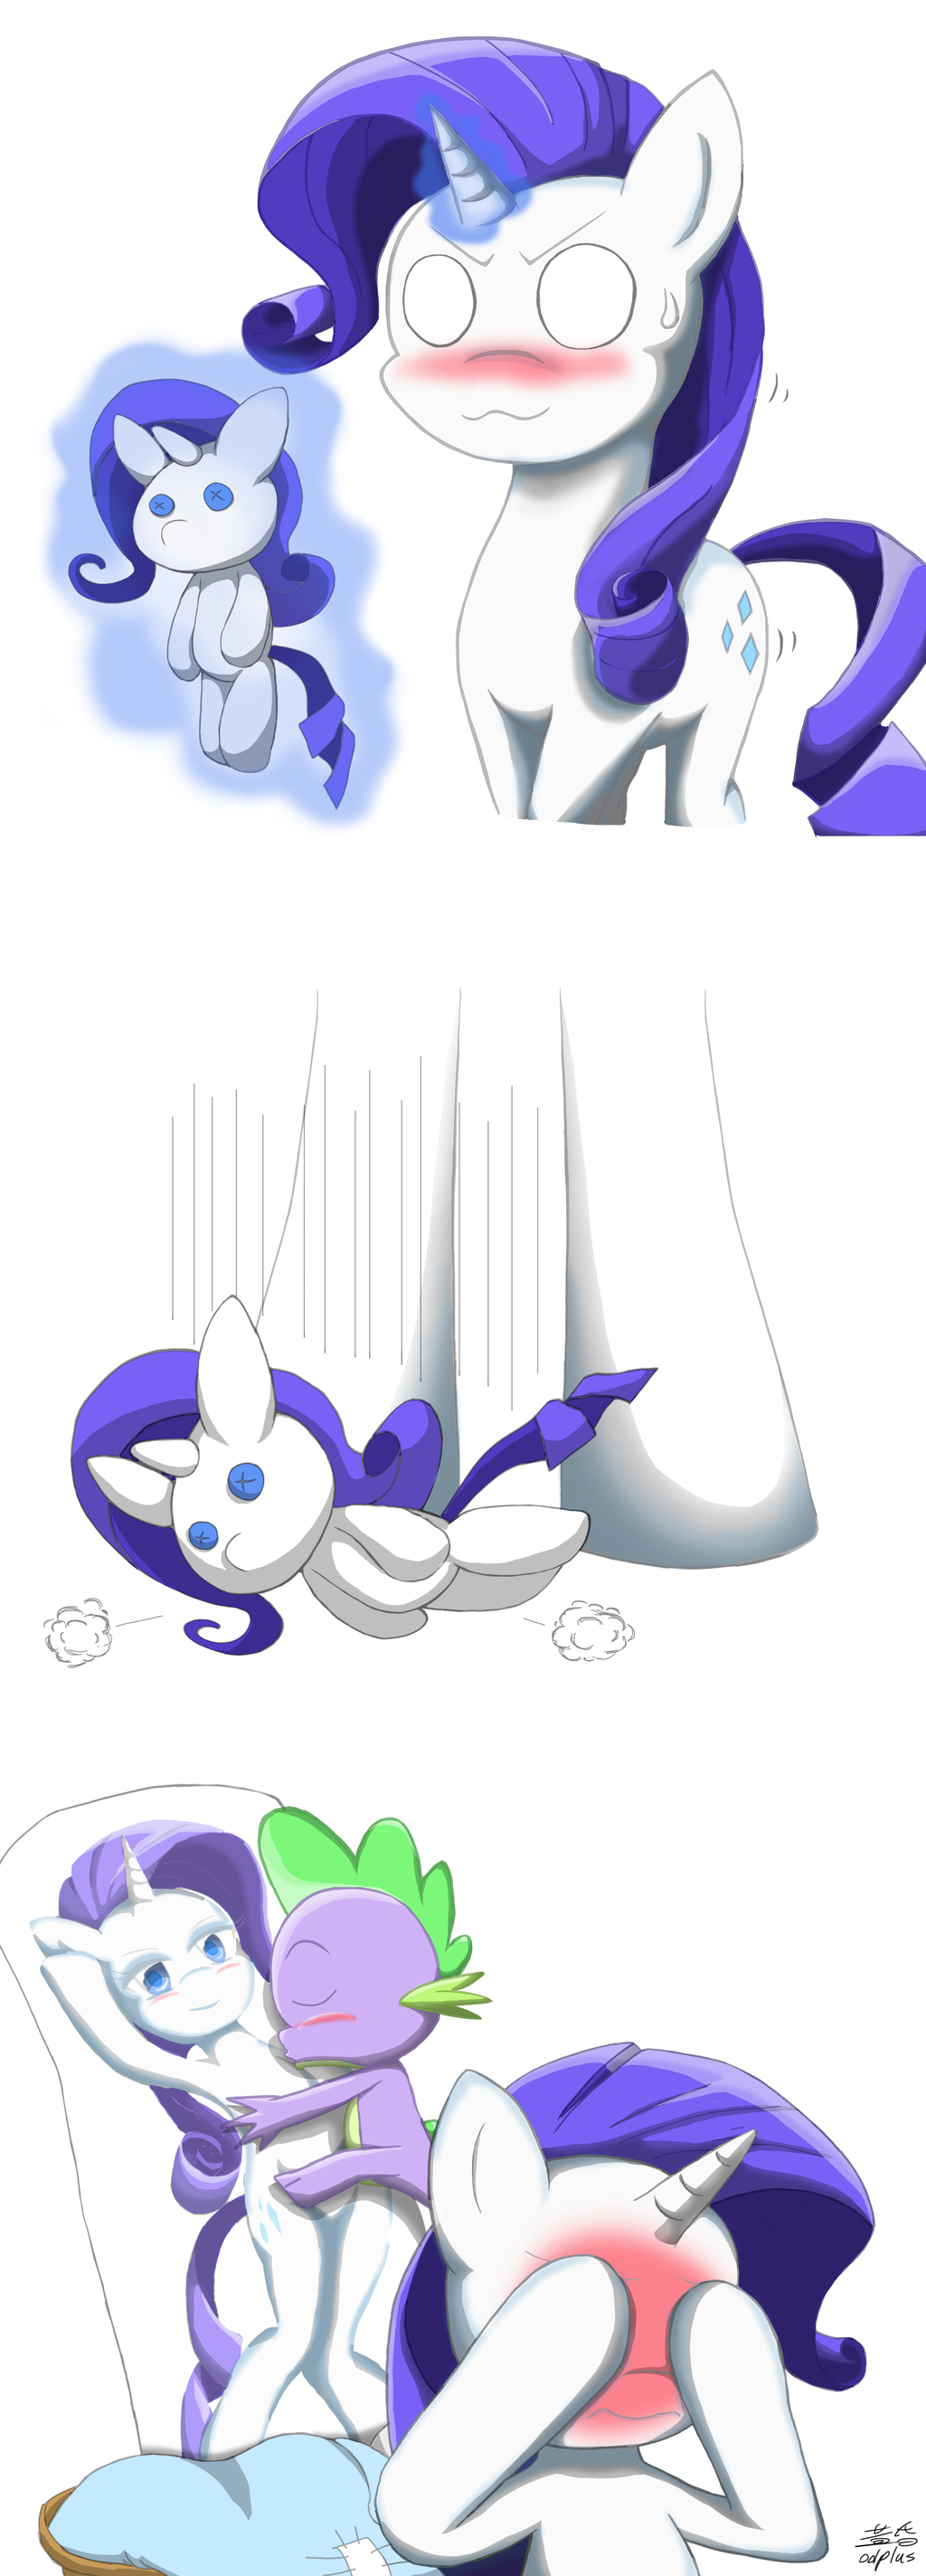 Twilight Sparkle Rarity Rainbow Dash Pony purple cartoon mammal violet nose vertebrate fictional character art clip